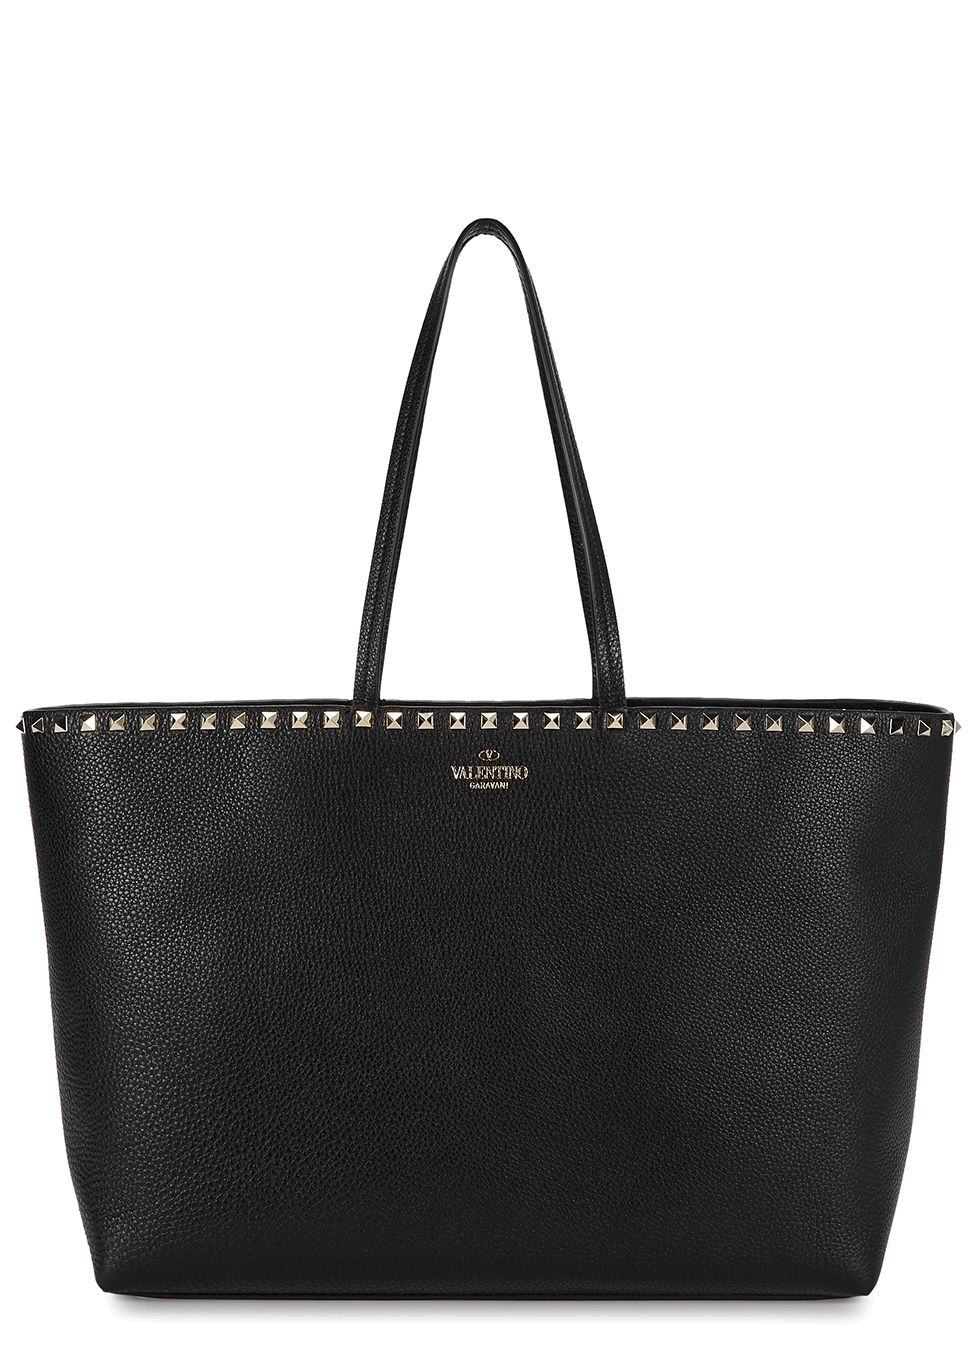 Valentino Garavani Rockstud black leather tote